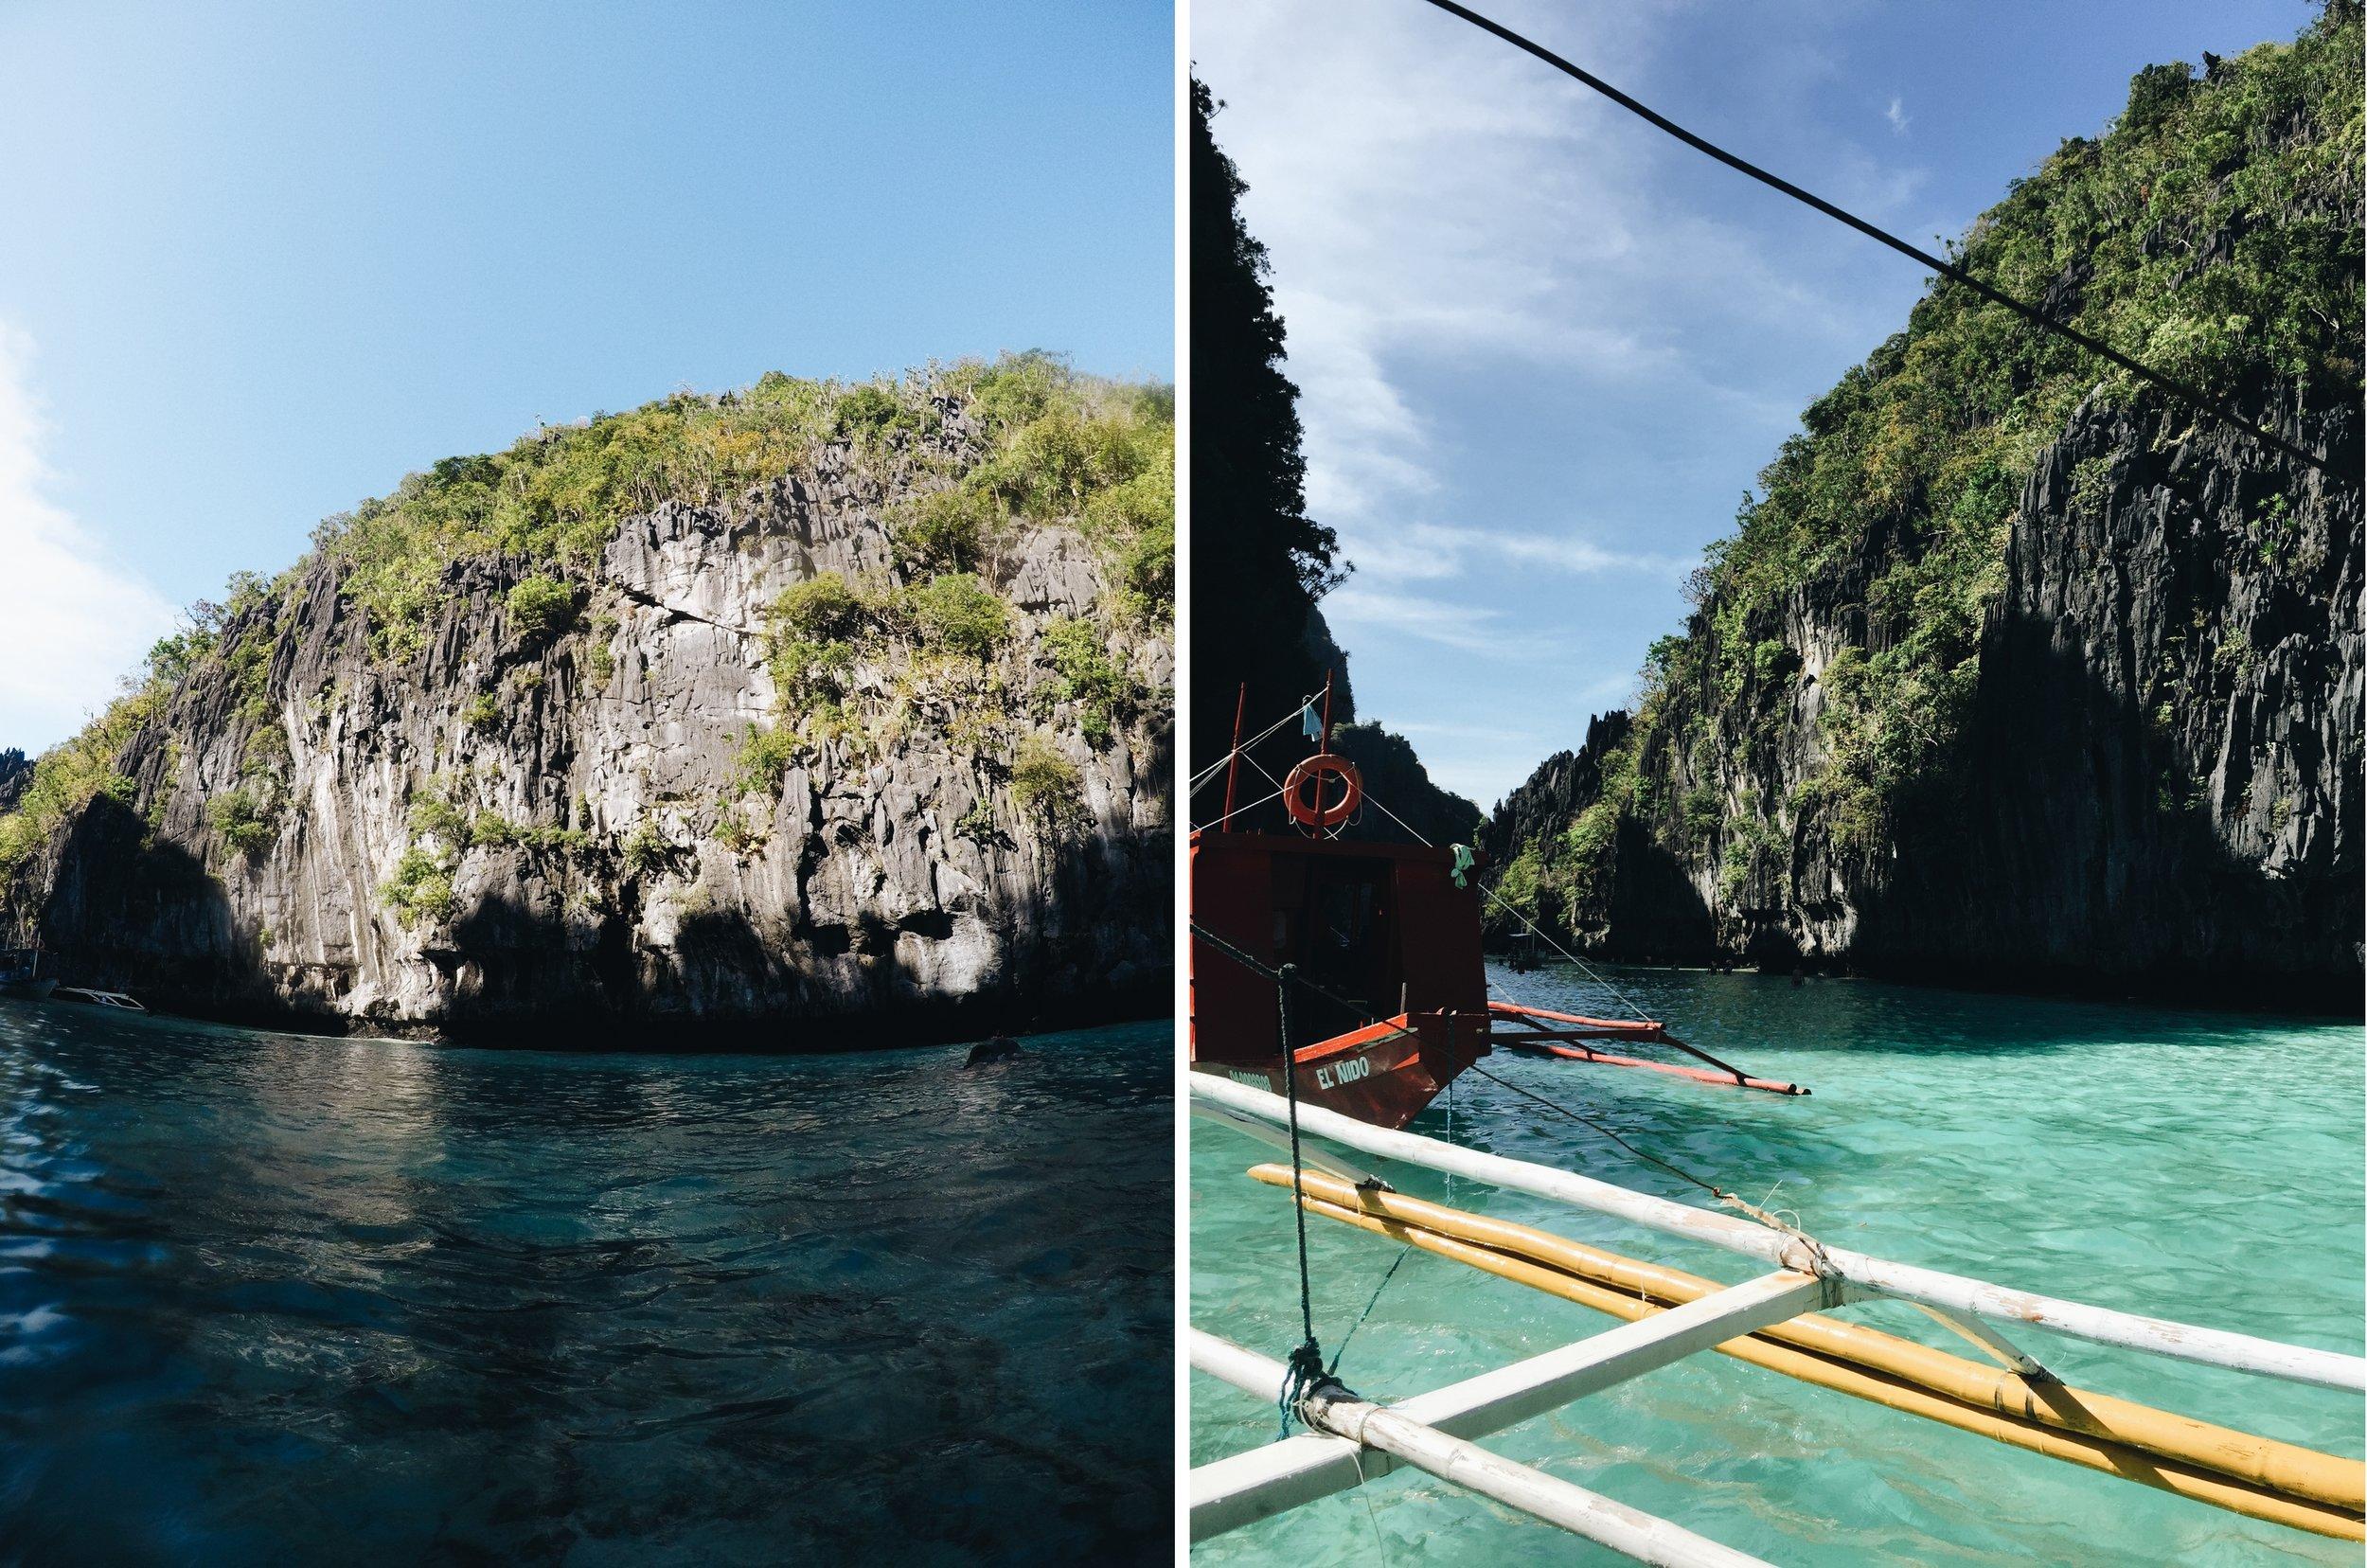 Big-lagoon-bacuit-el-nido-palawan-philippines-blog.jpg